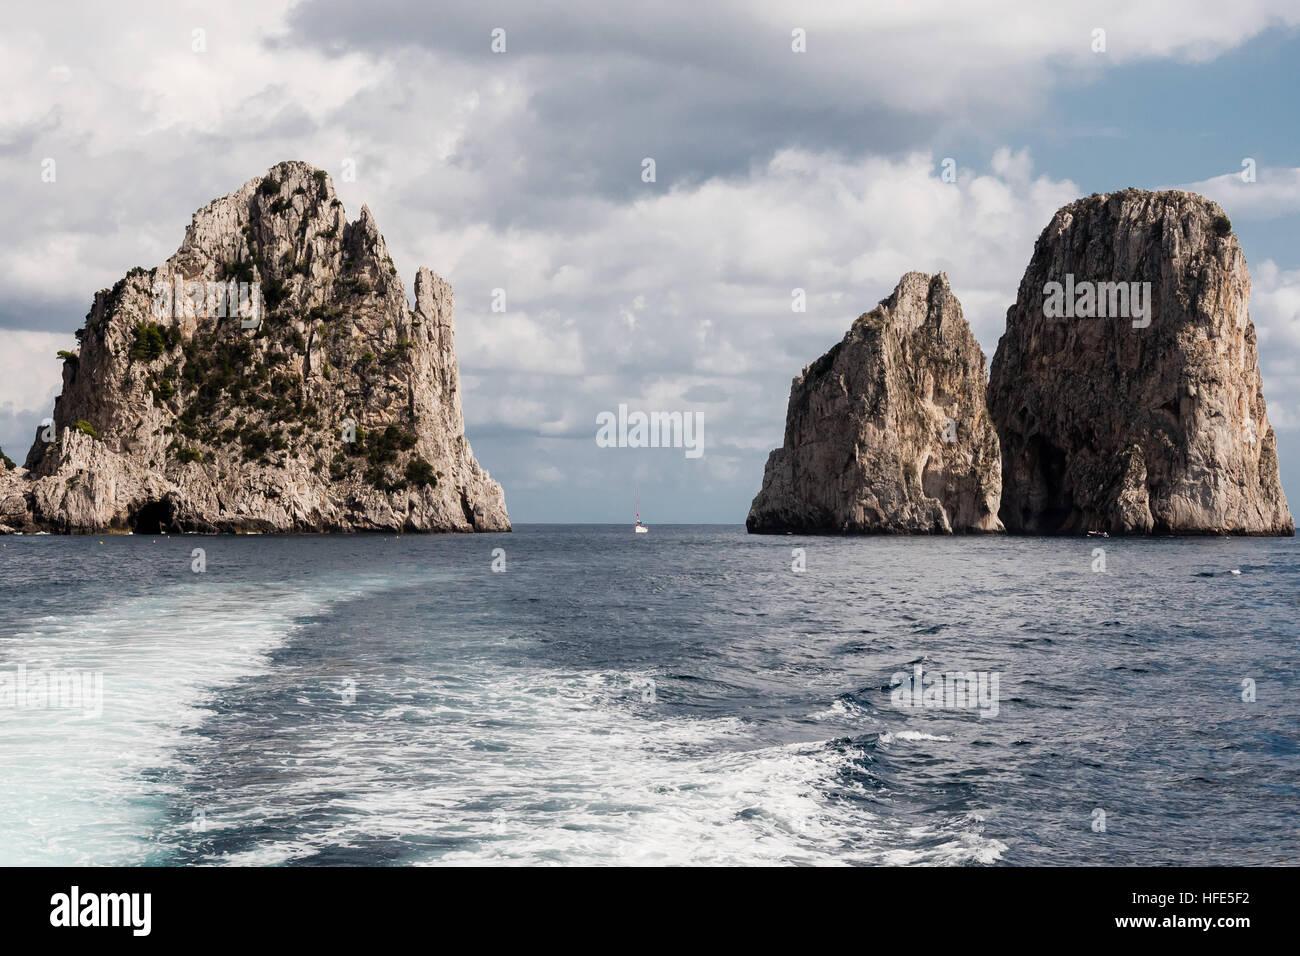 View from tourist boat on Faraglioni - three famous rocks,Capri, Italy - Stock Image